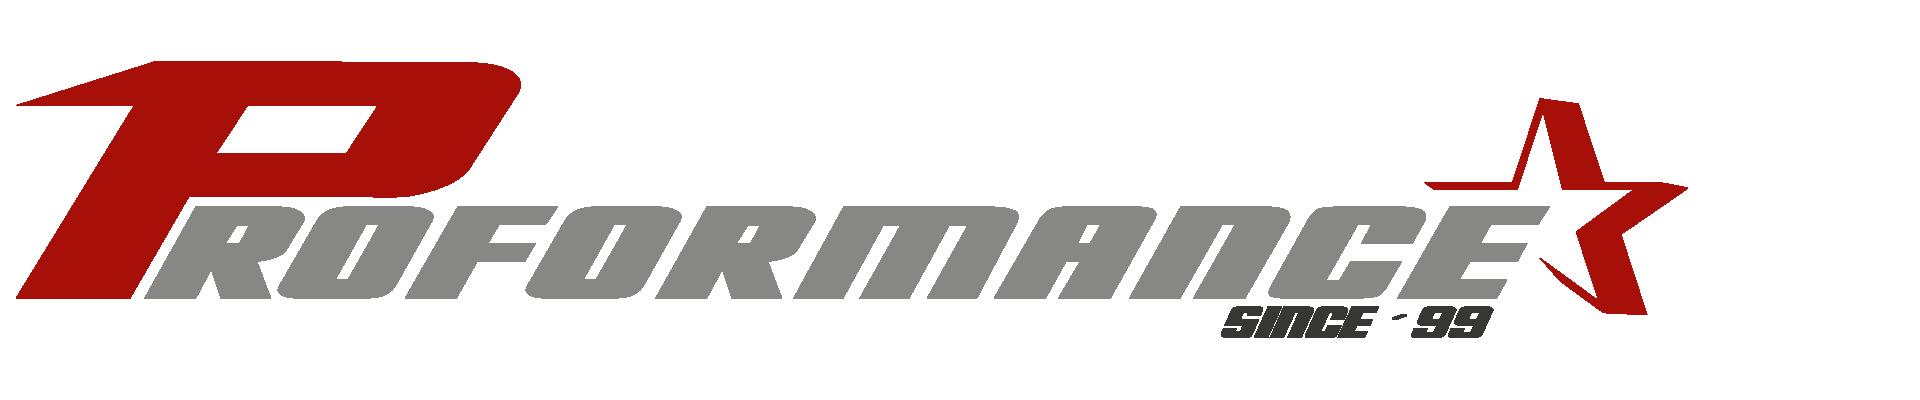 PROformance Studios GmbH